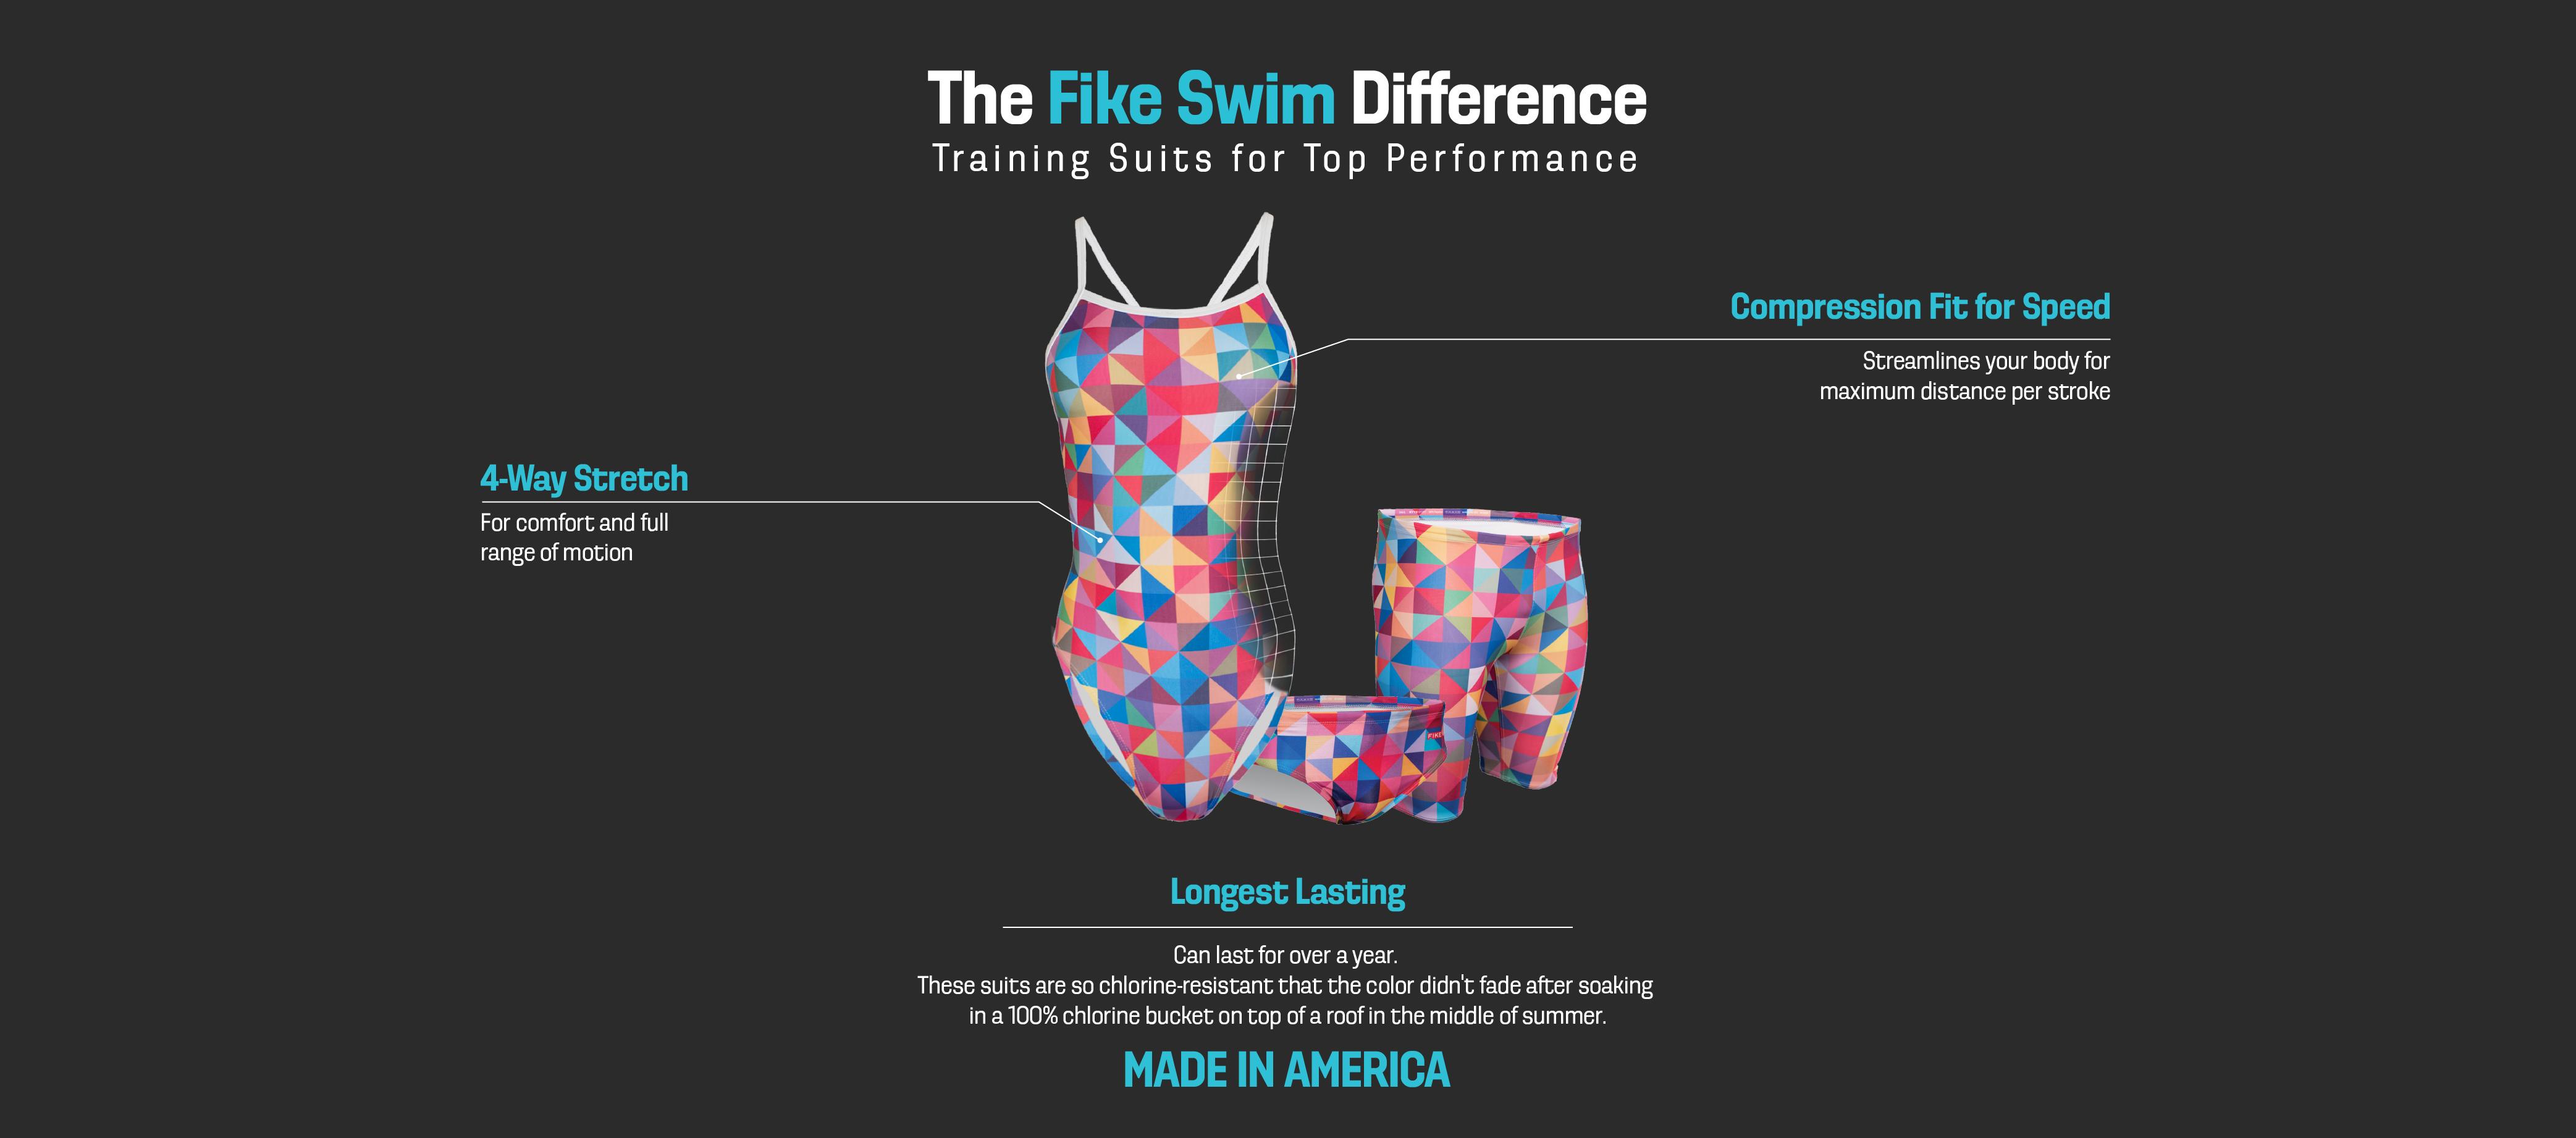 Fike Swim training suit features